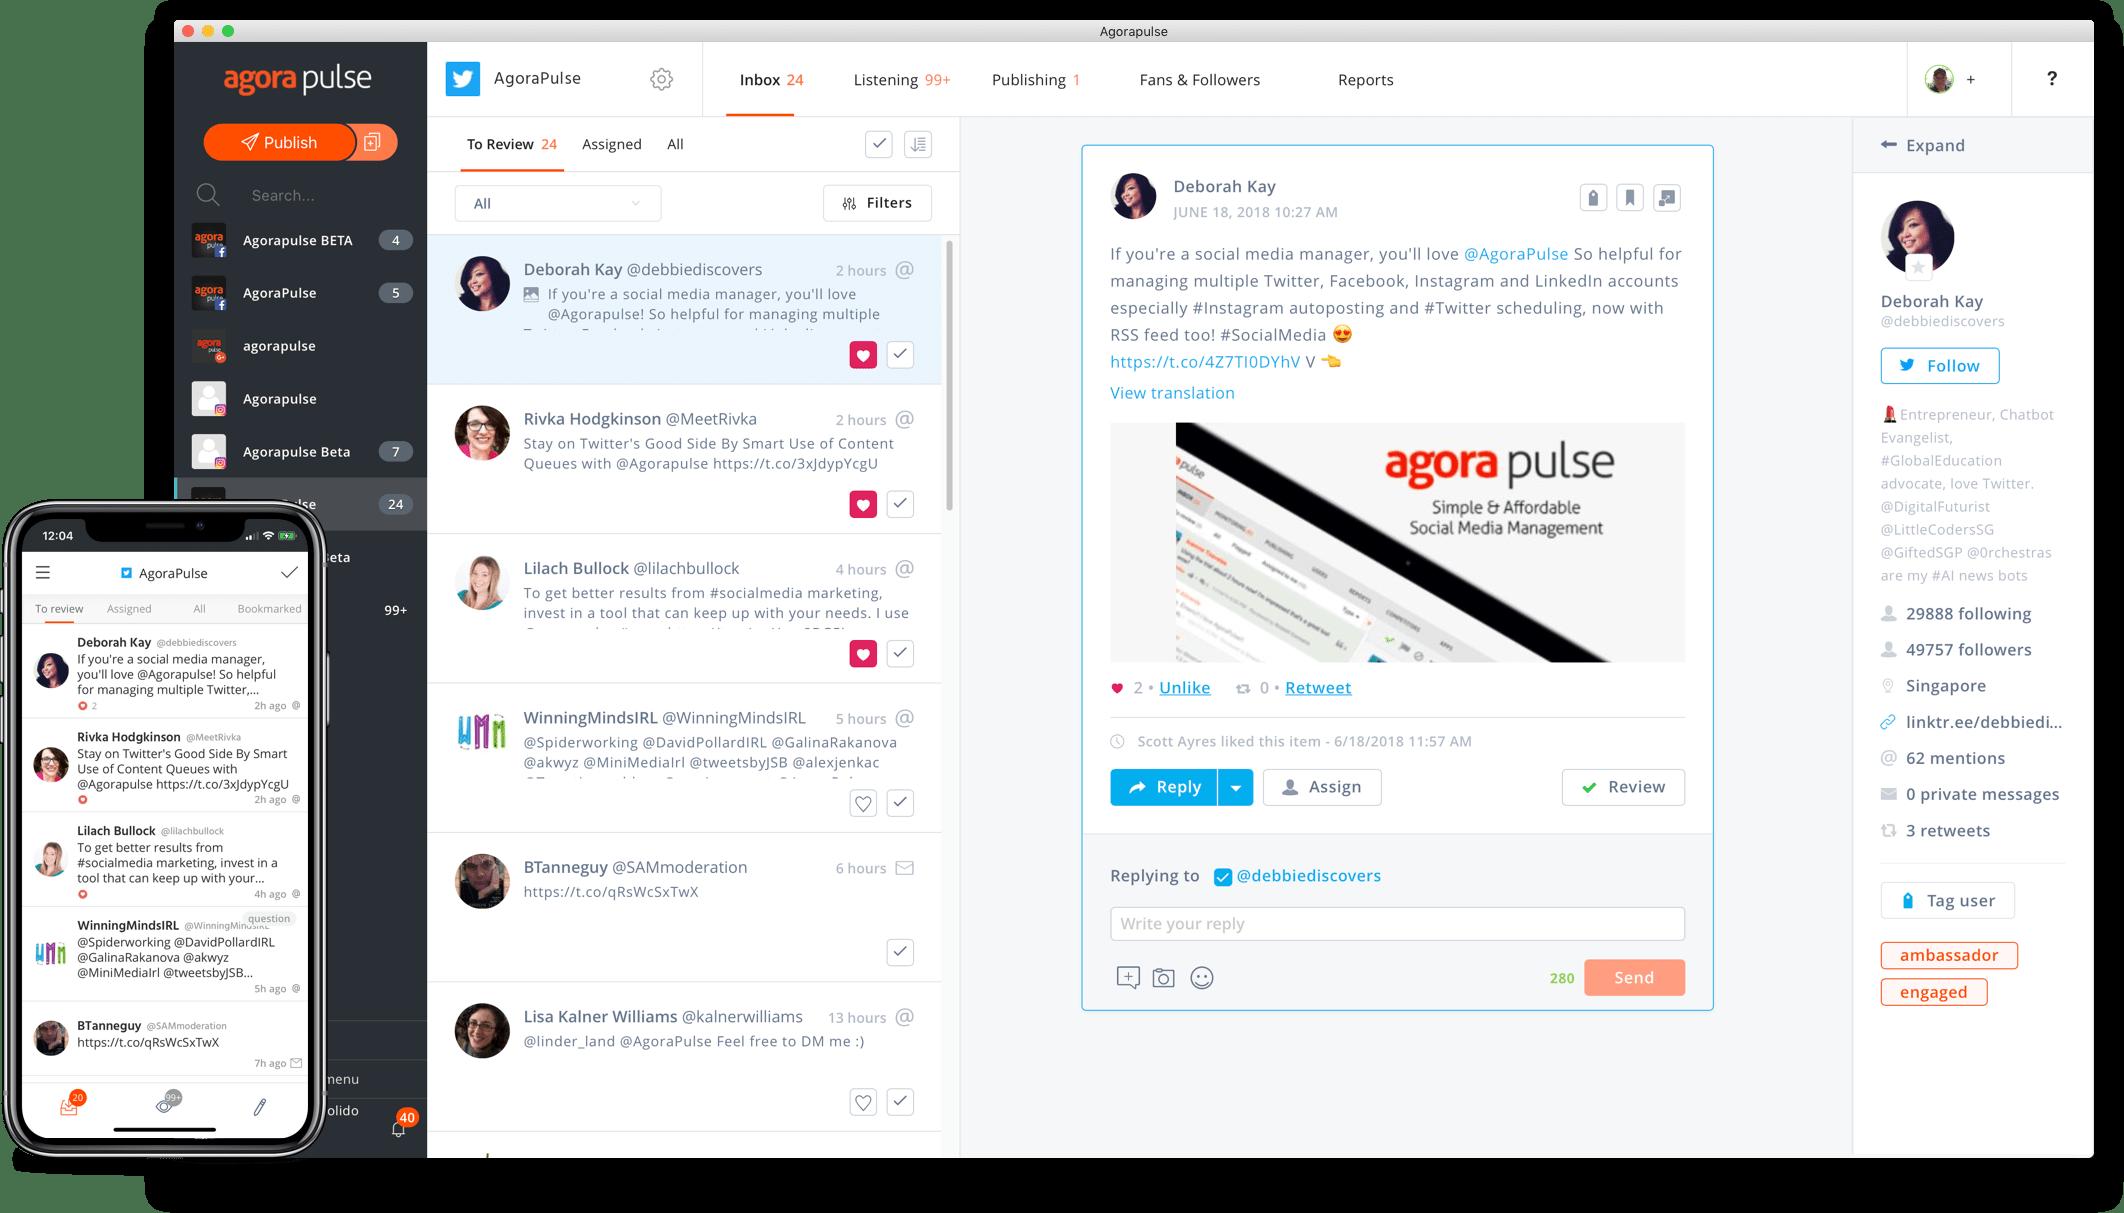 Agorapulse : outil de social media management